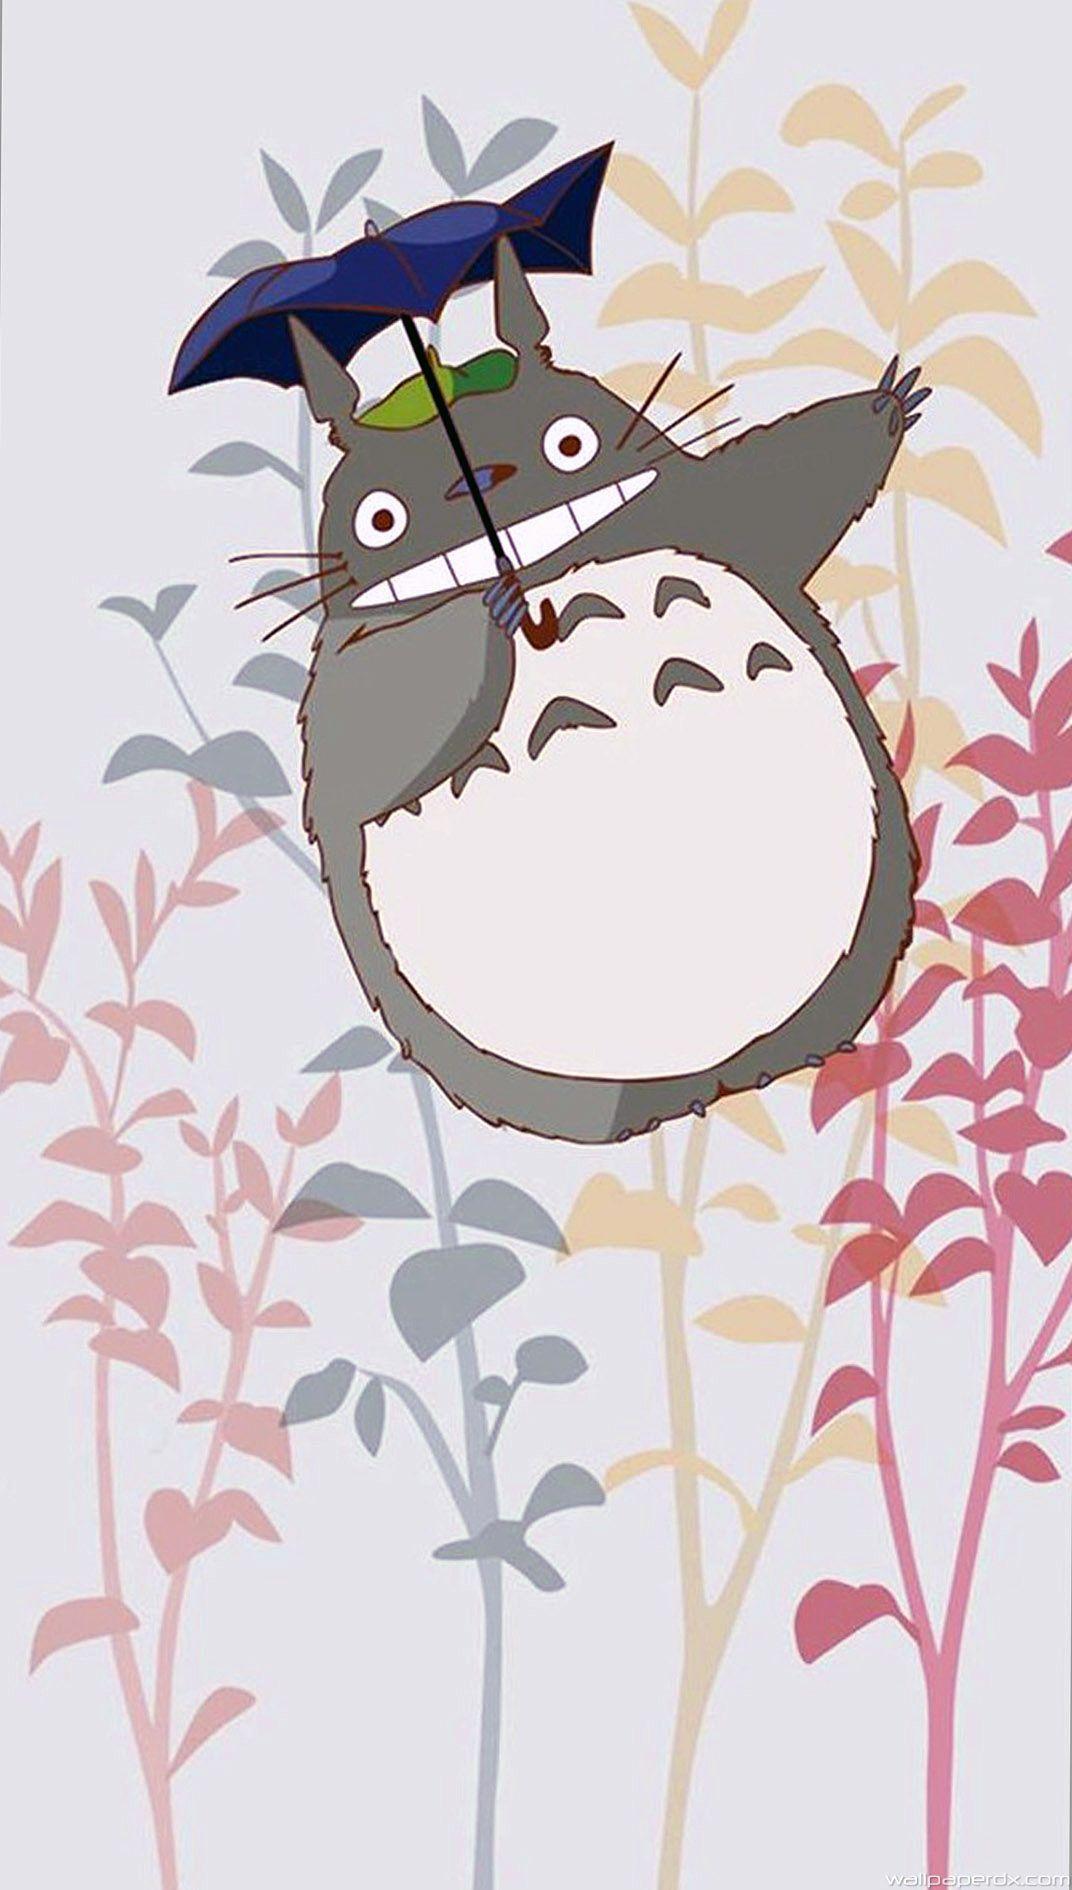 Totoro wallpapers top free totoro backgrounds - Totoro wallpaper iphone ...